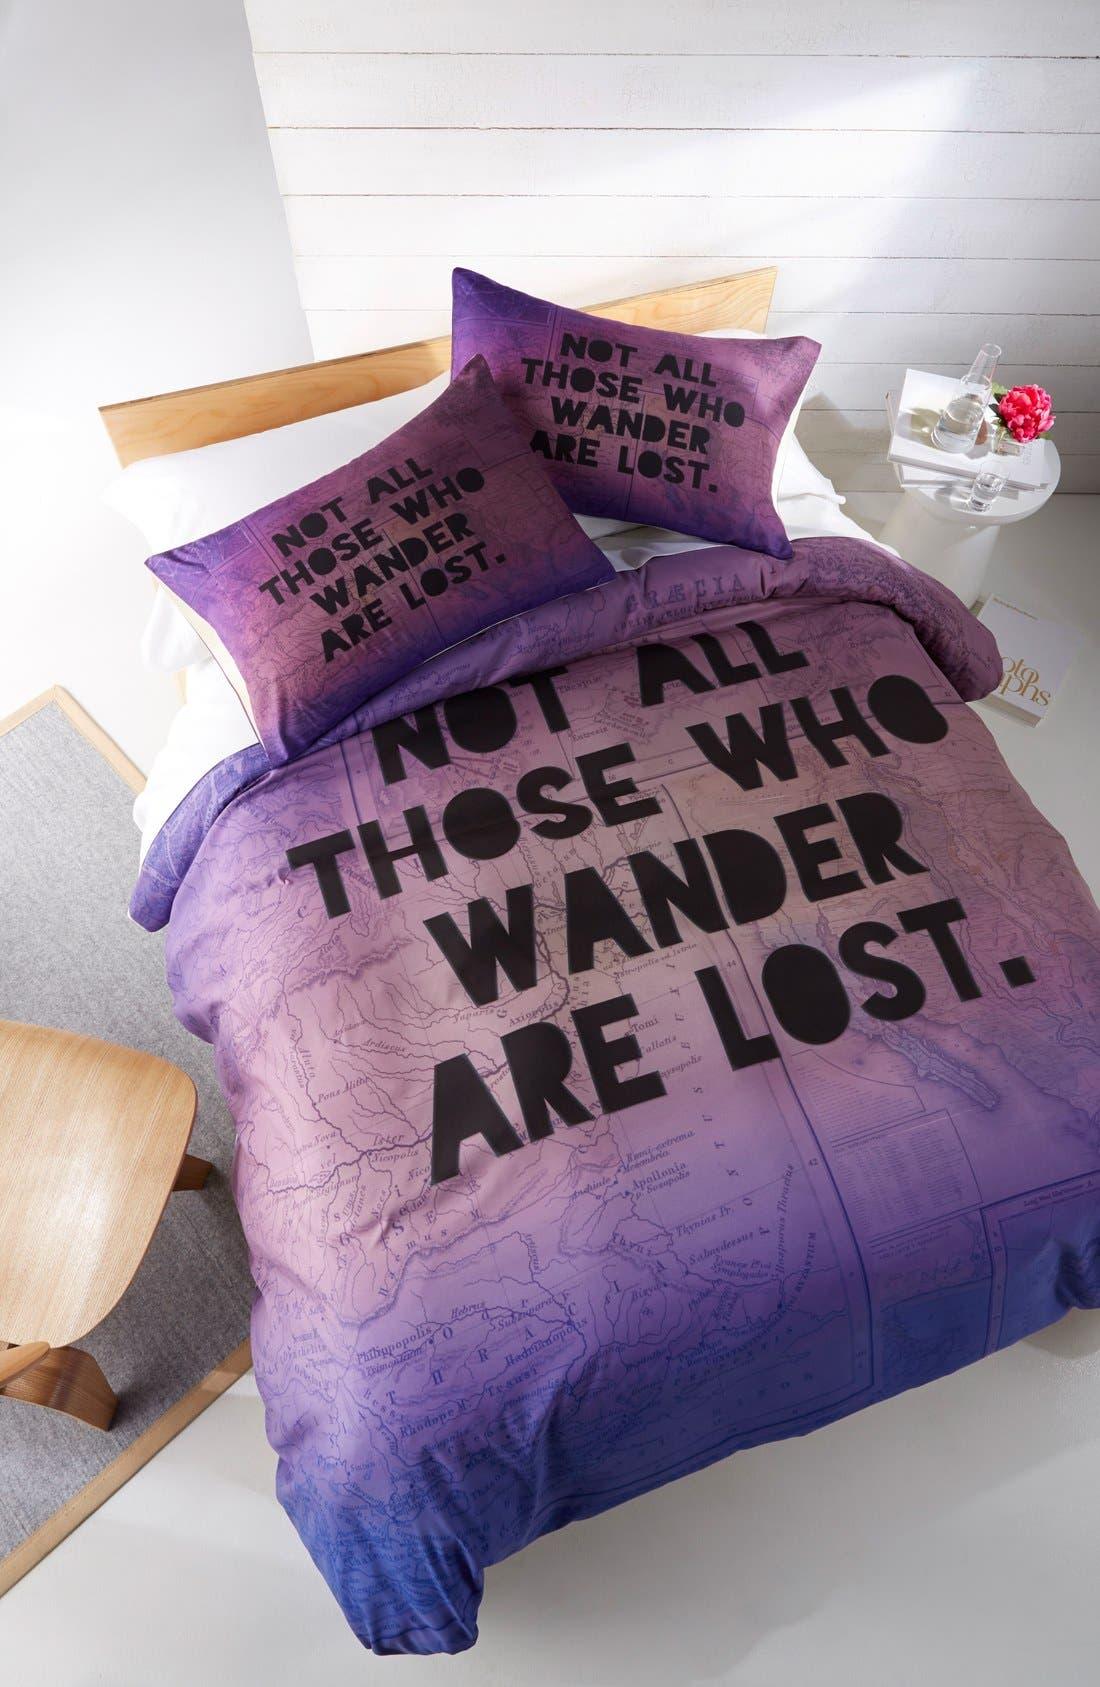 Alternate Image 1 Selected - DENY Designs 'Those Who Wander' Duvet Cover Set